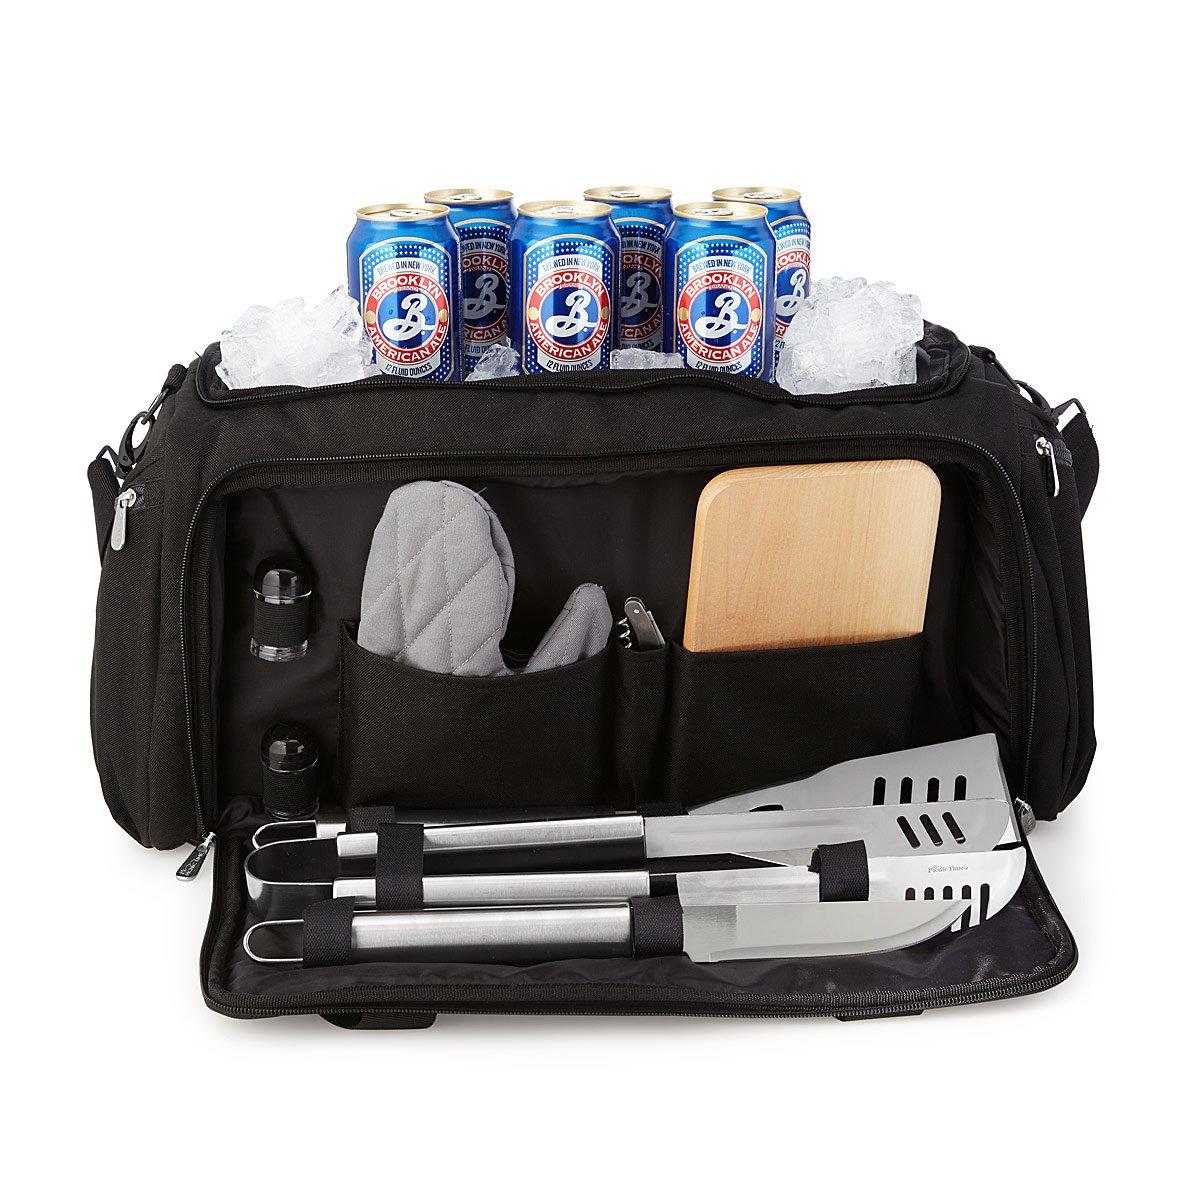 bbq-kit-cooler